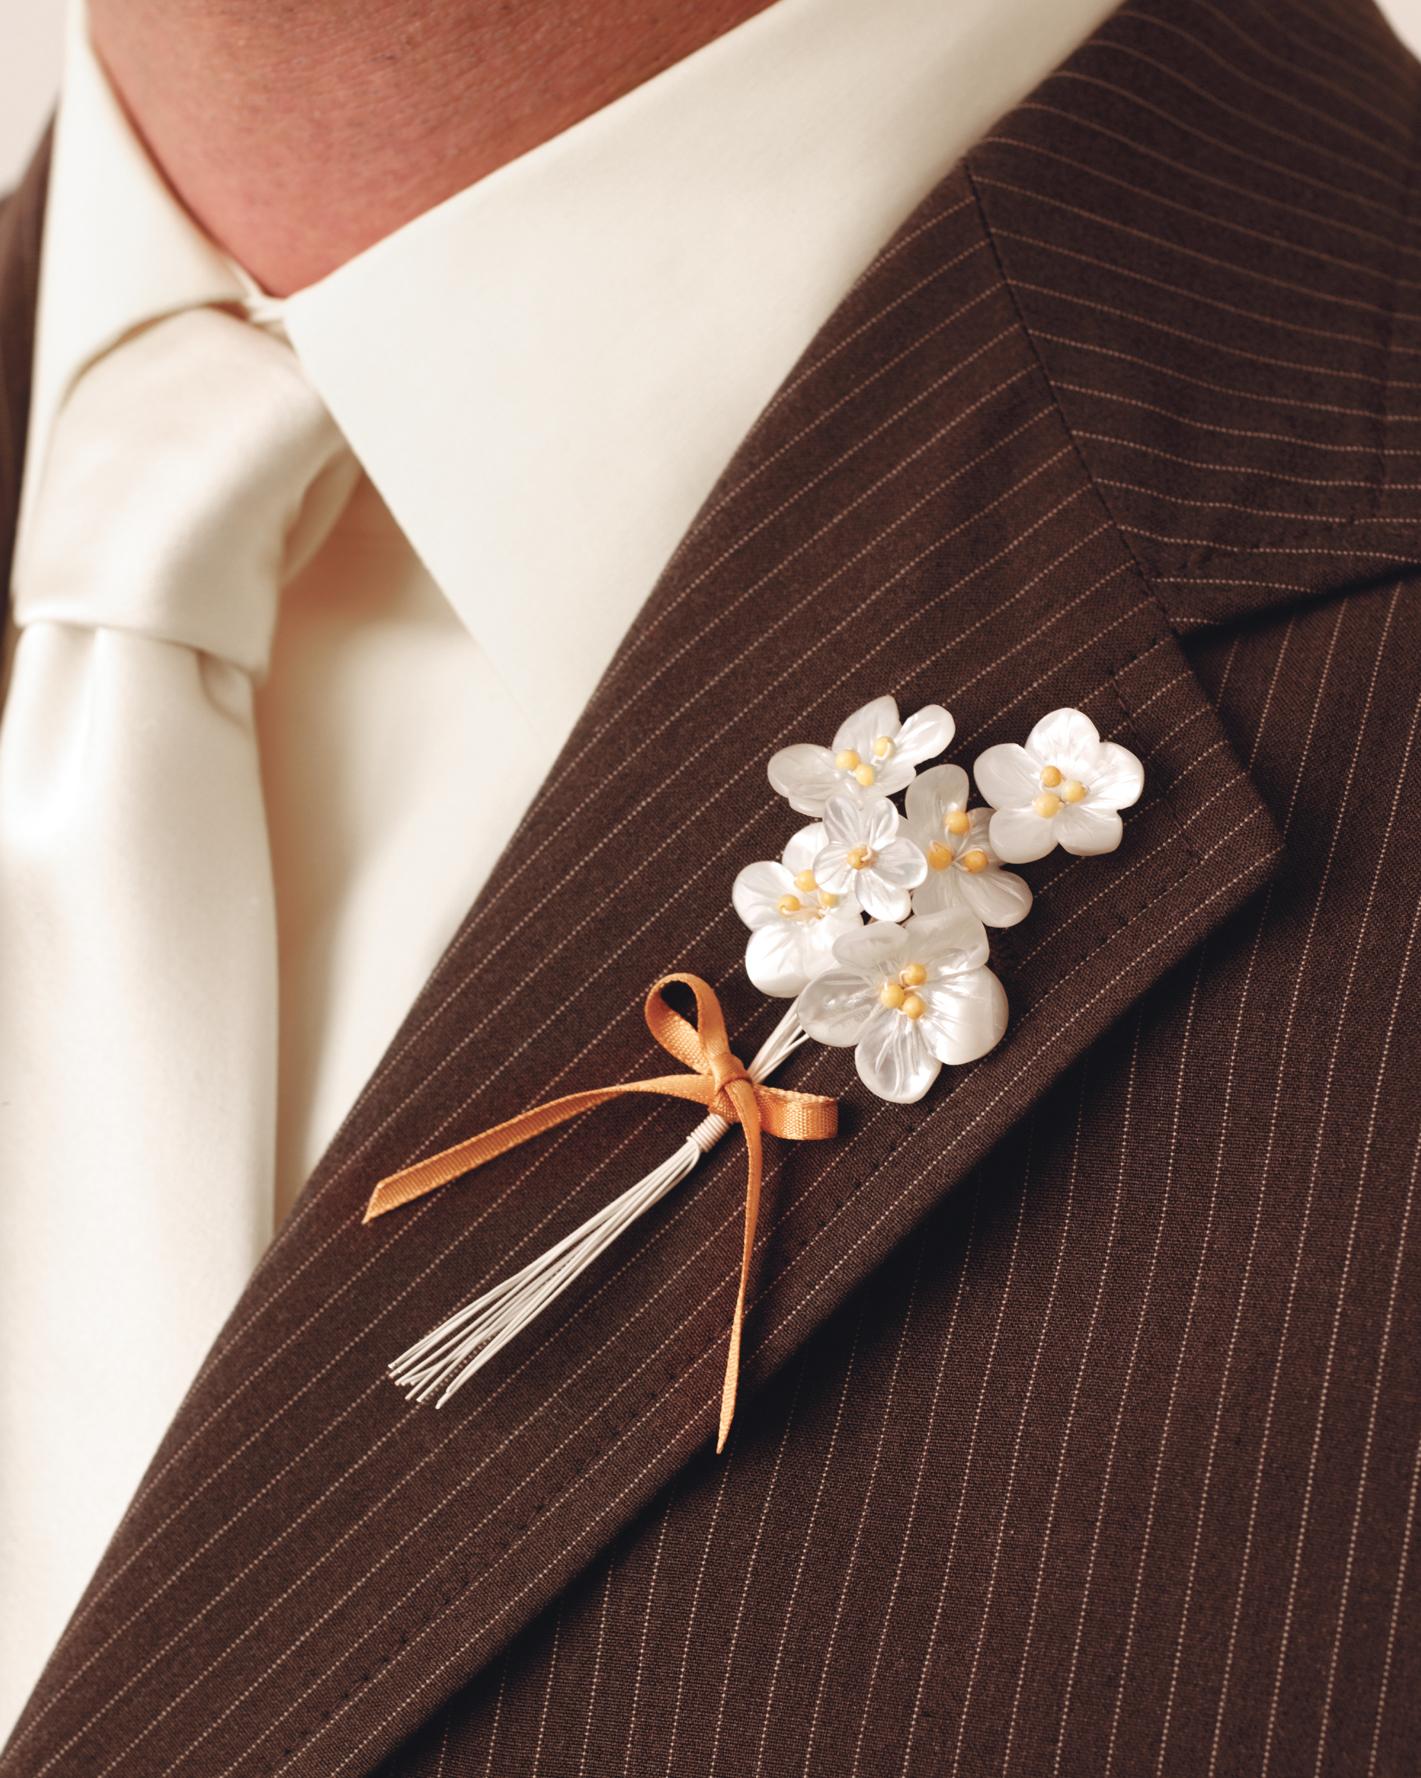 diy-boutonnieres-wd101250flower-0115.jpg